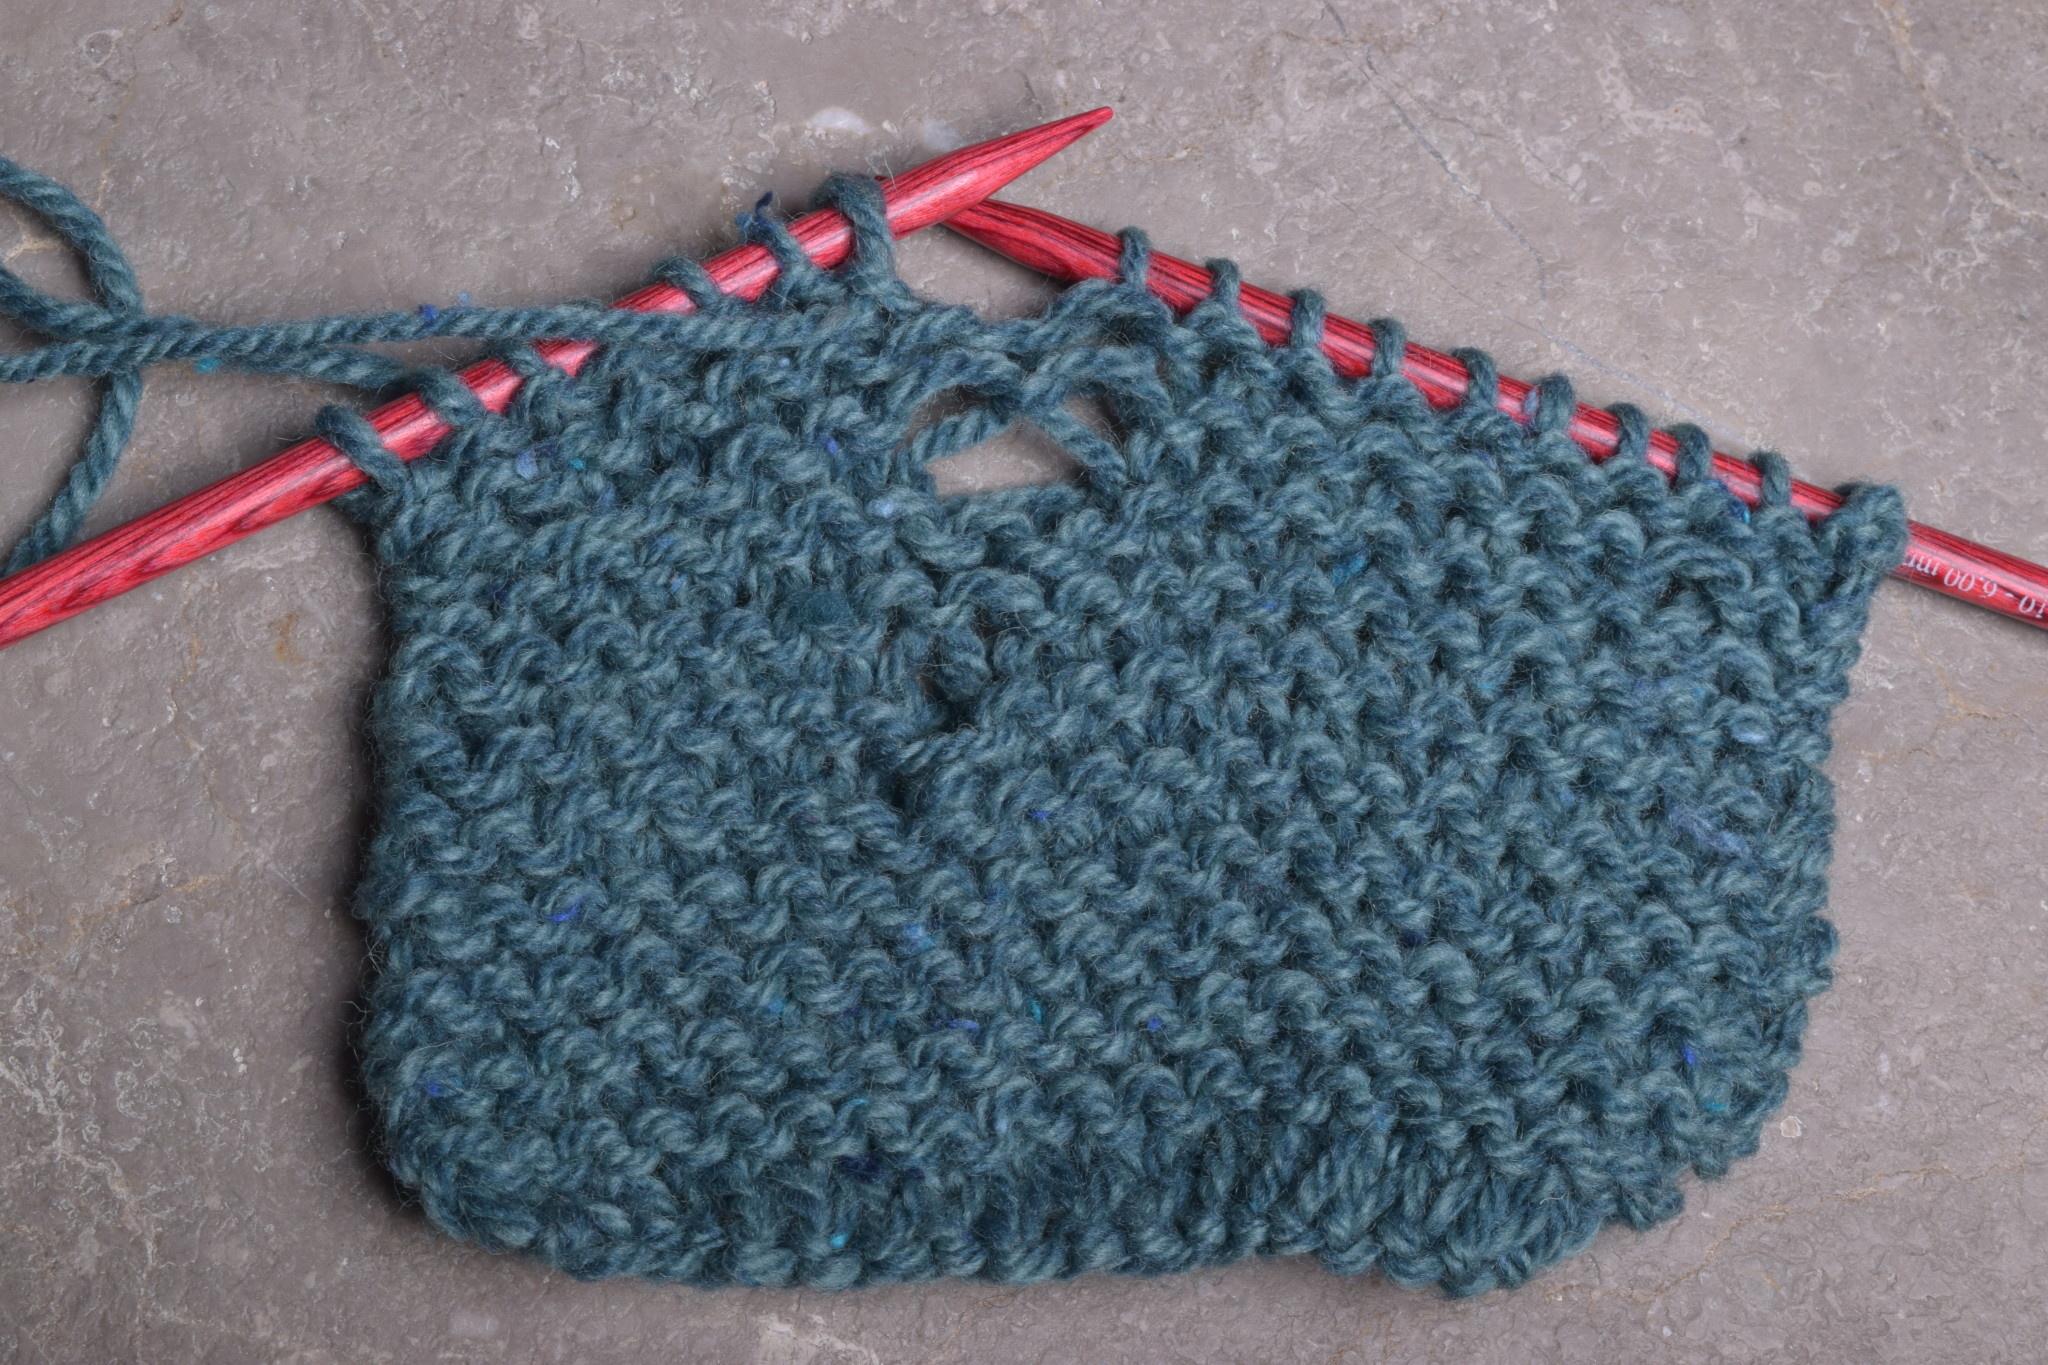 Fixing Knitting Mistakes; Monday, April 15;  6:00-8:00PM